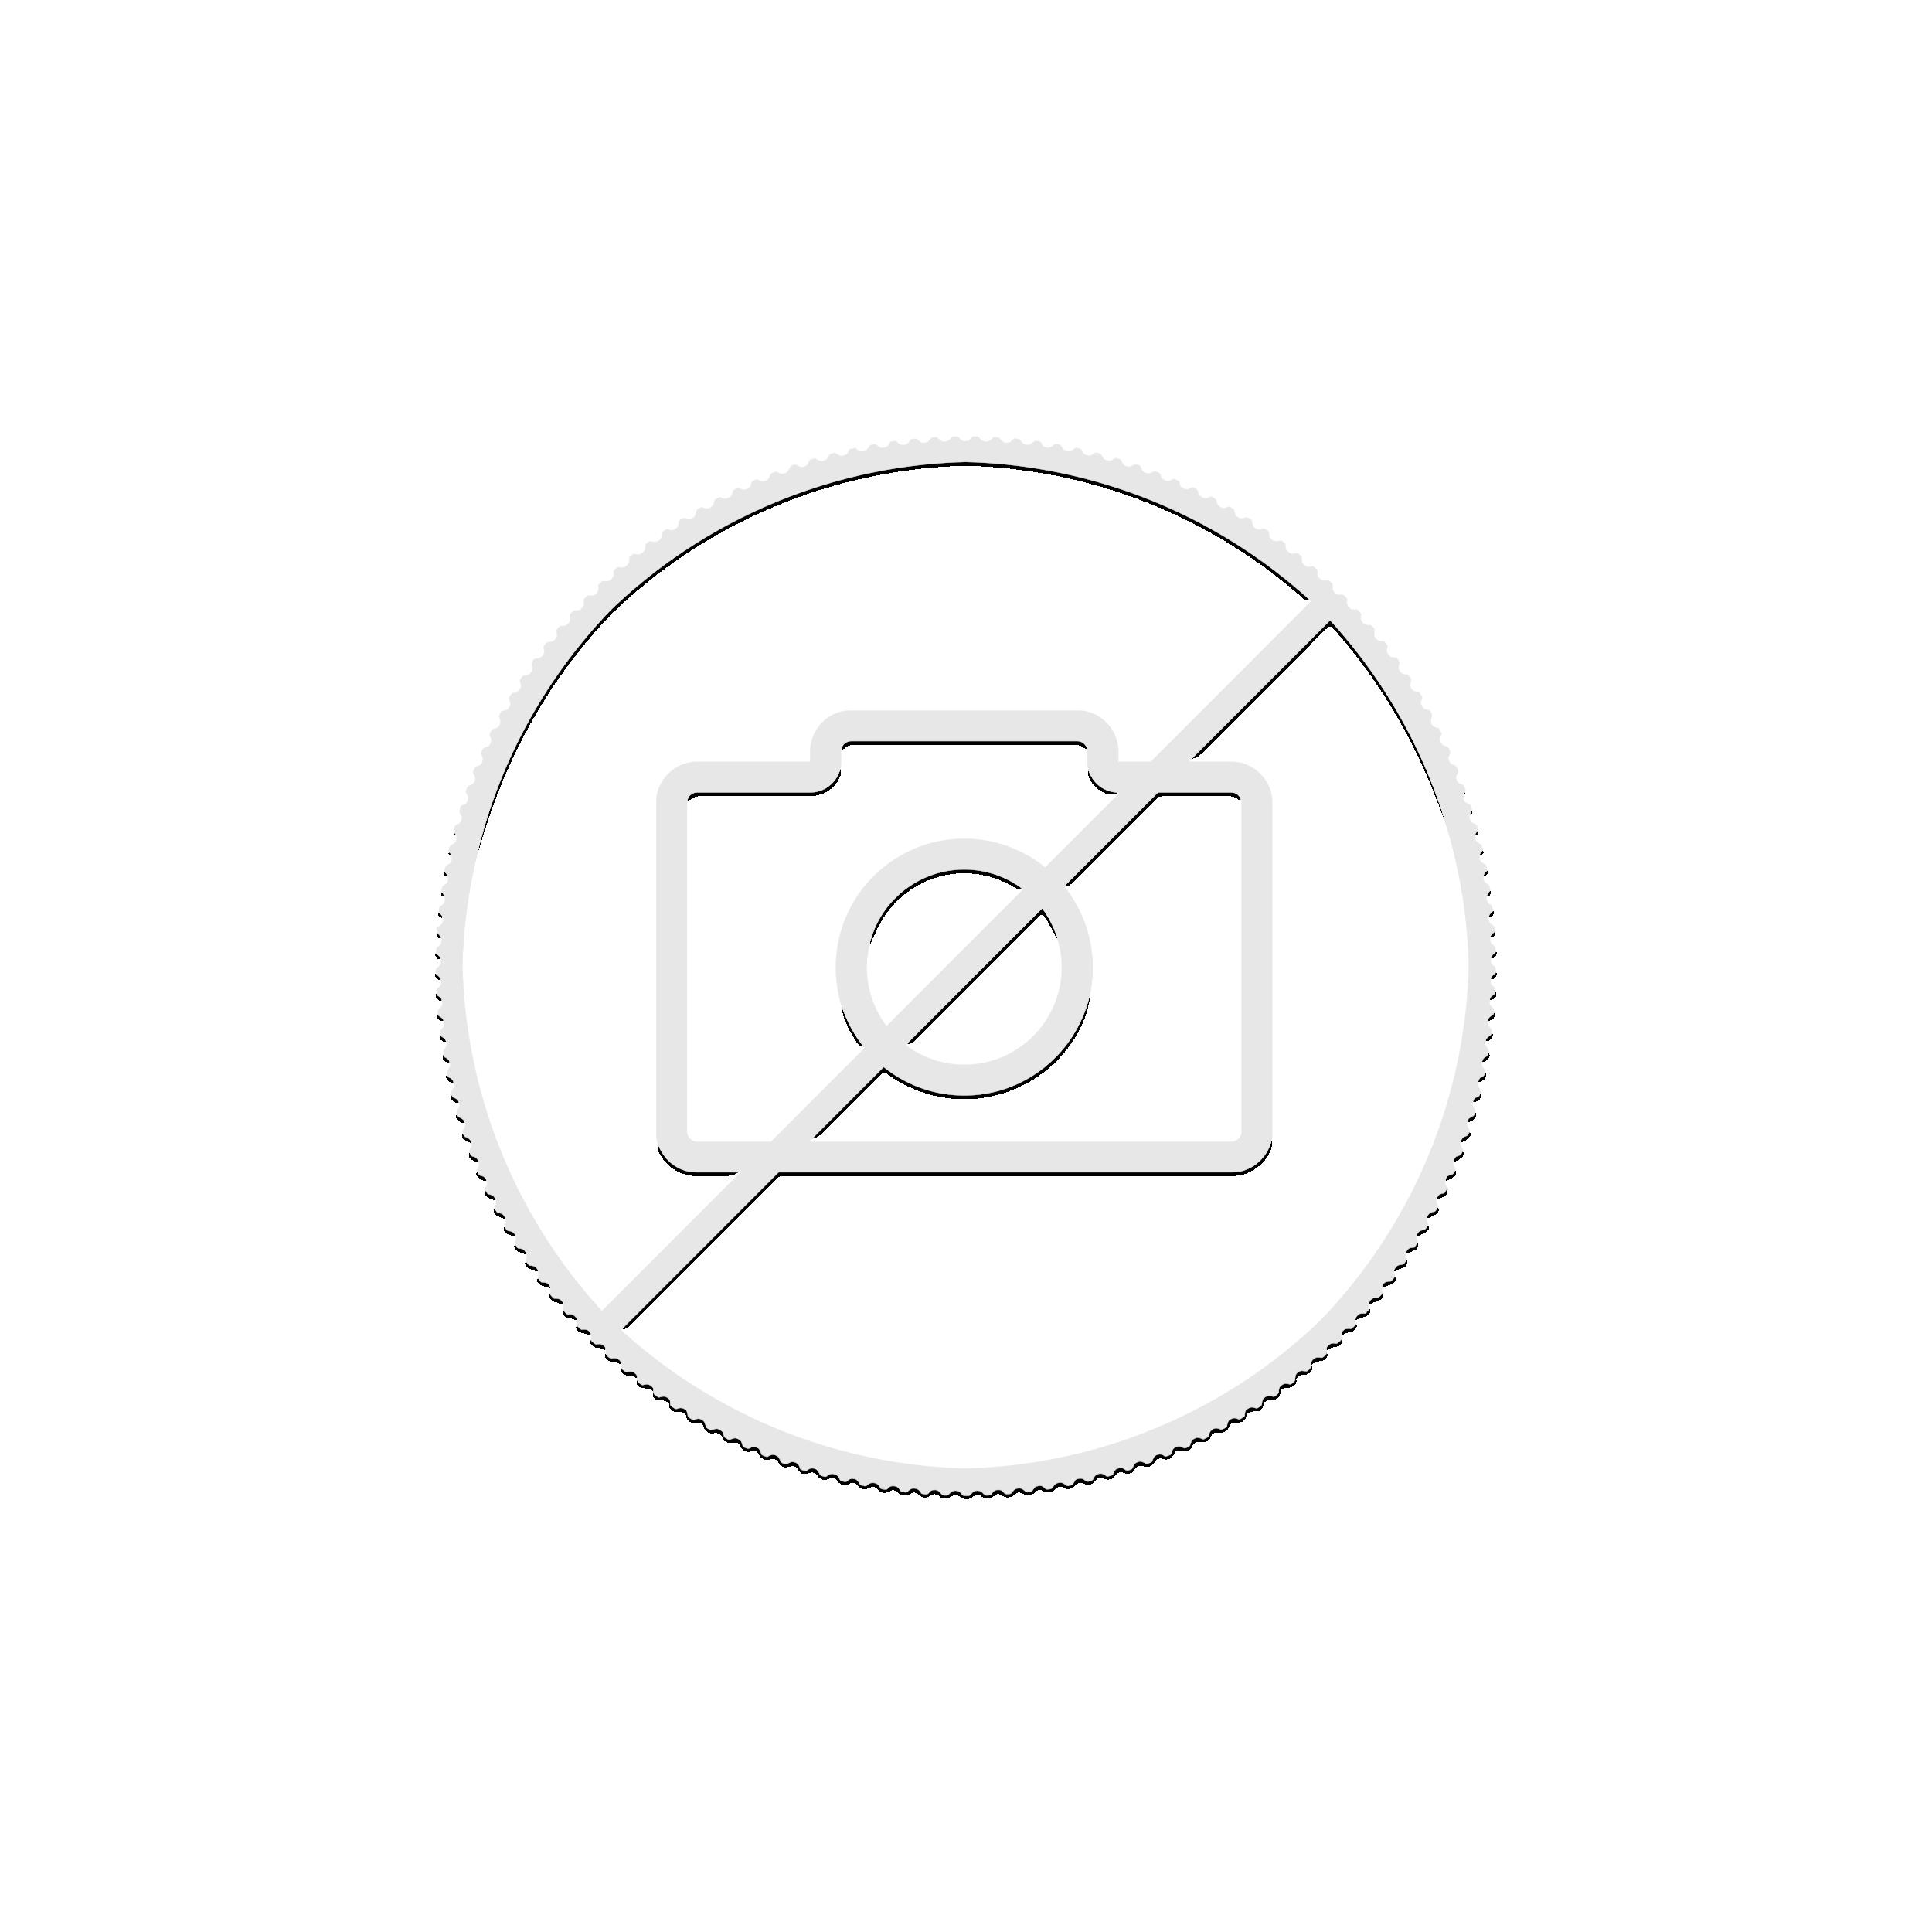 Gold coin love heart shape set 2021 proof